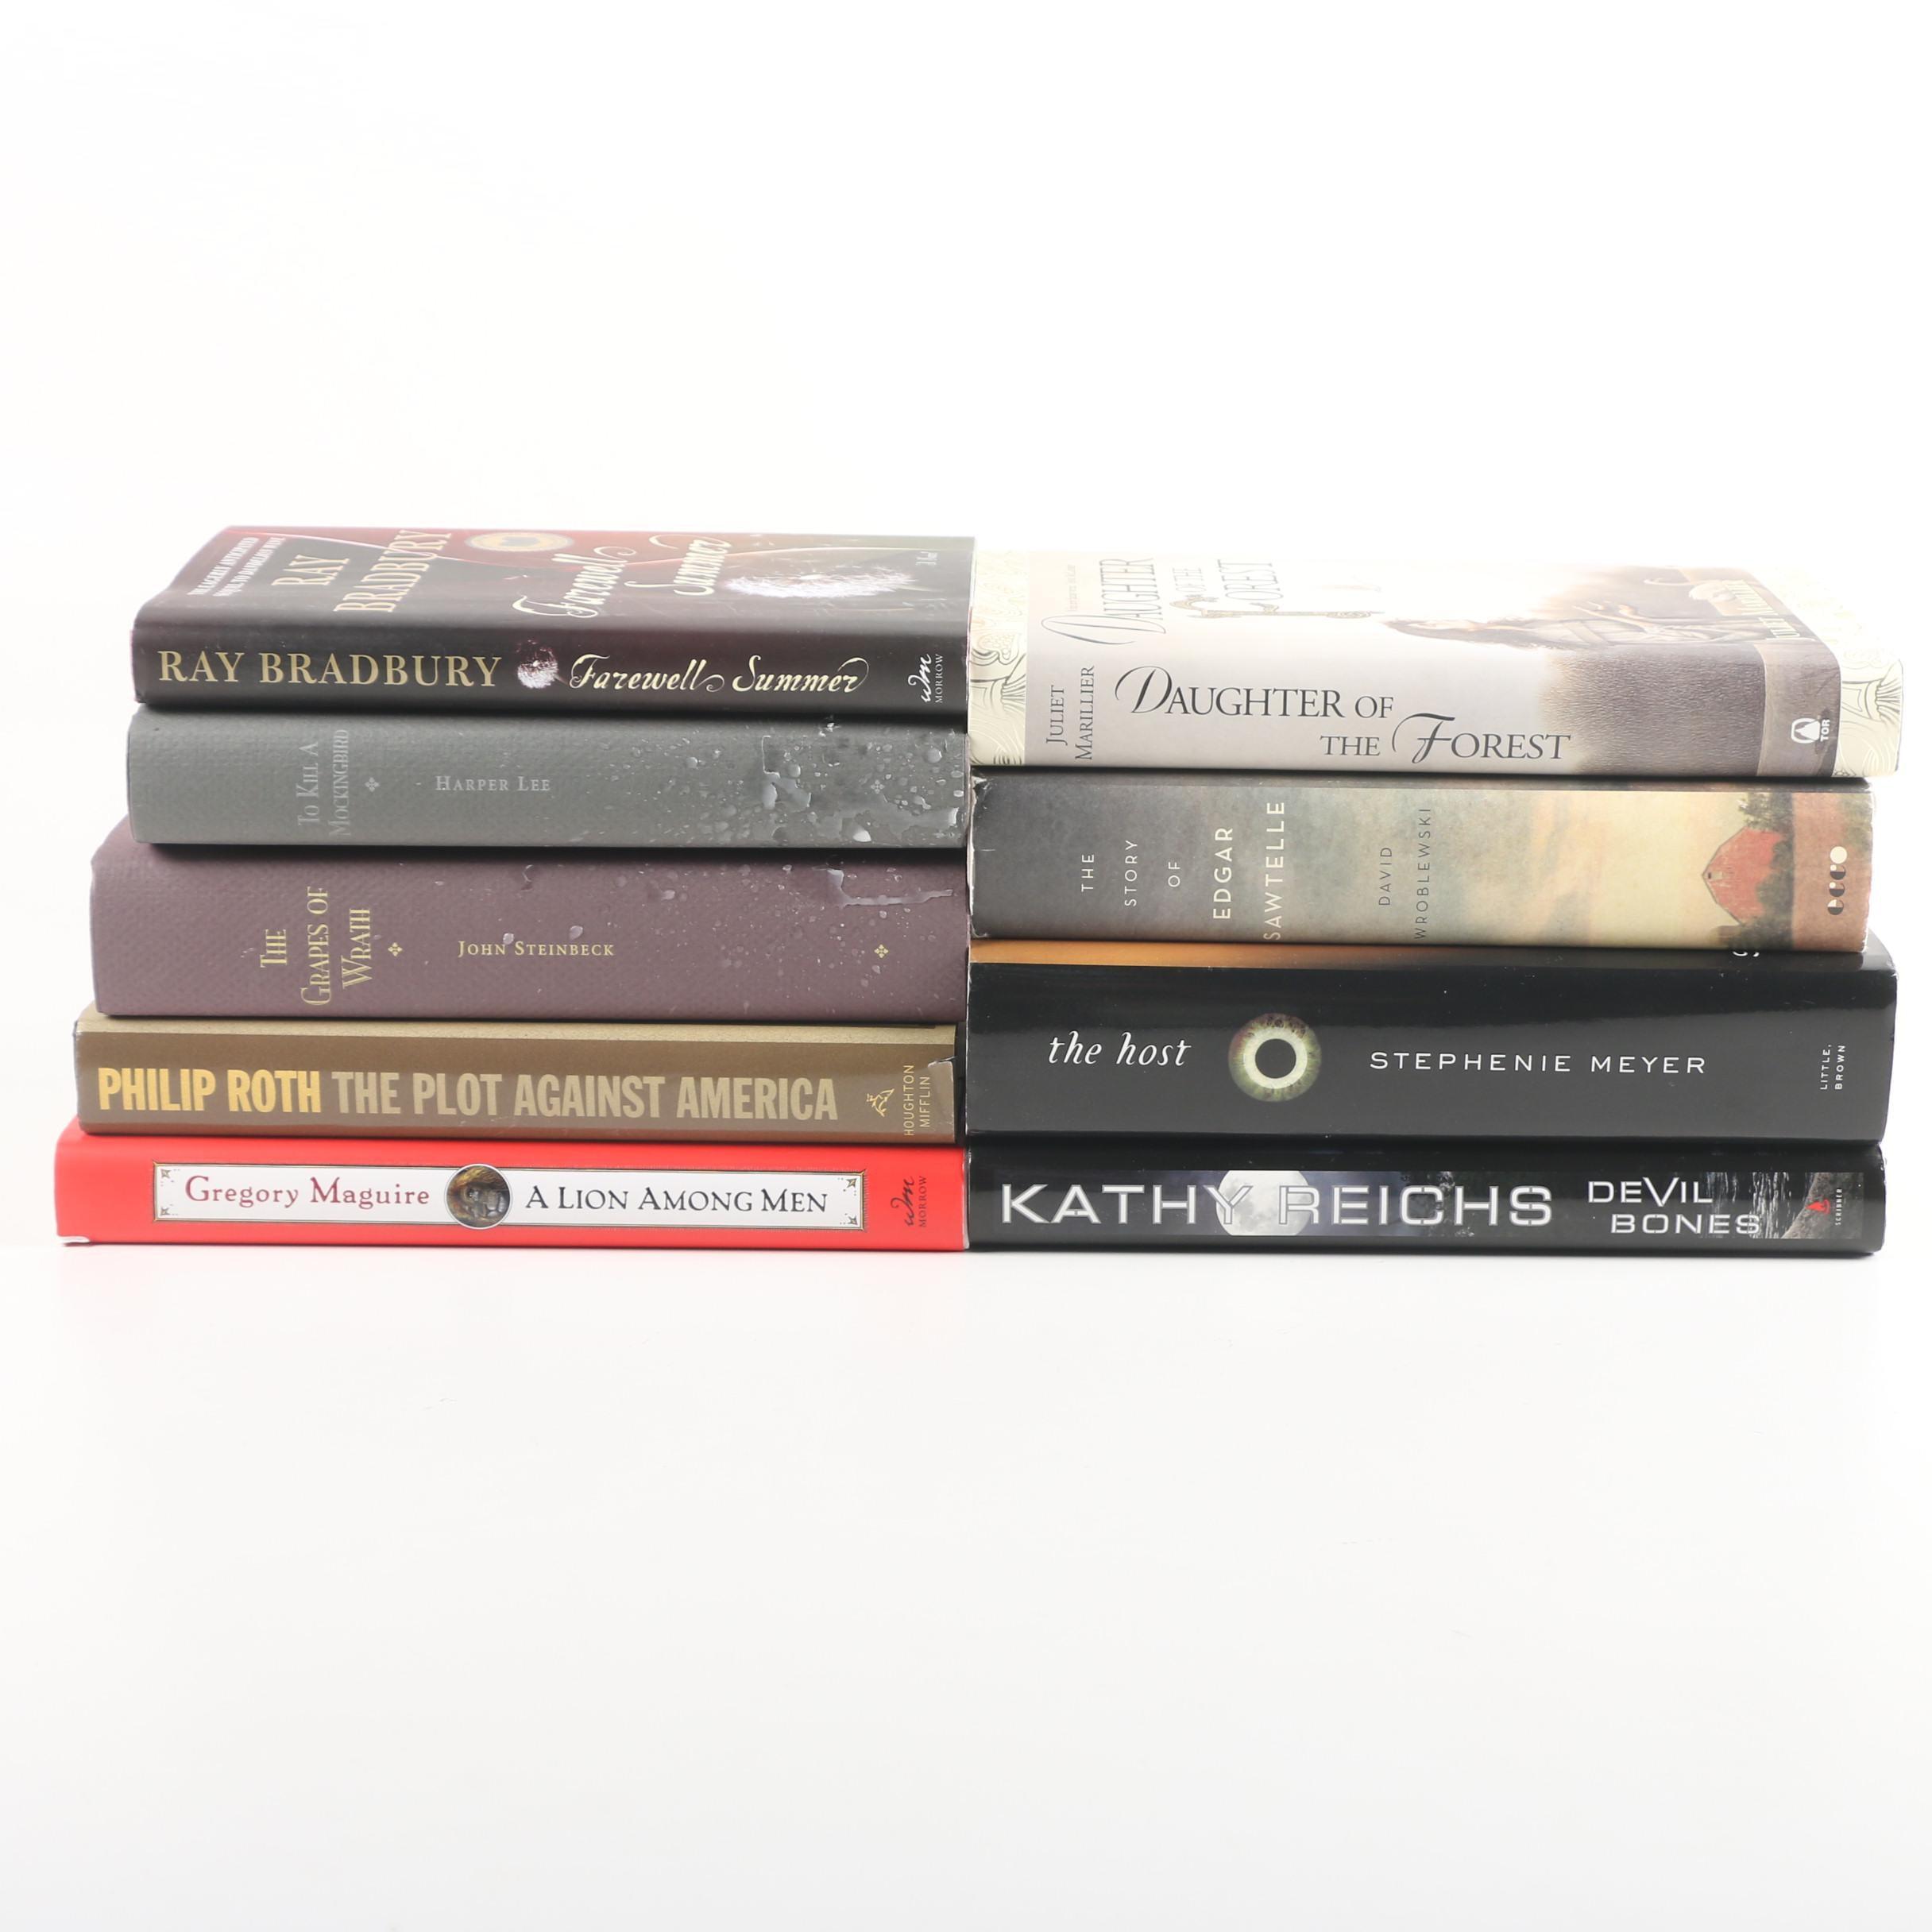 Fiction Books including Harper Lee, John Steinbeck, Philip Roth and Ray Bradbury